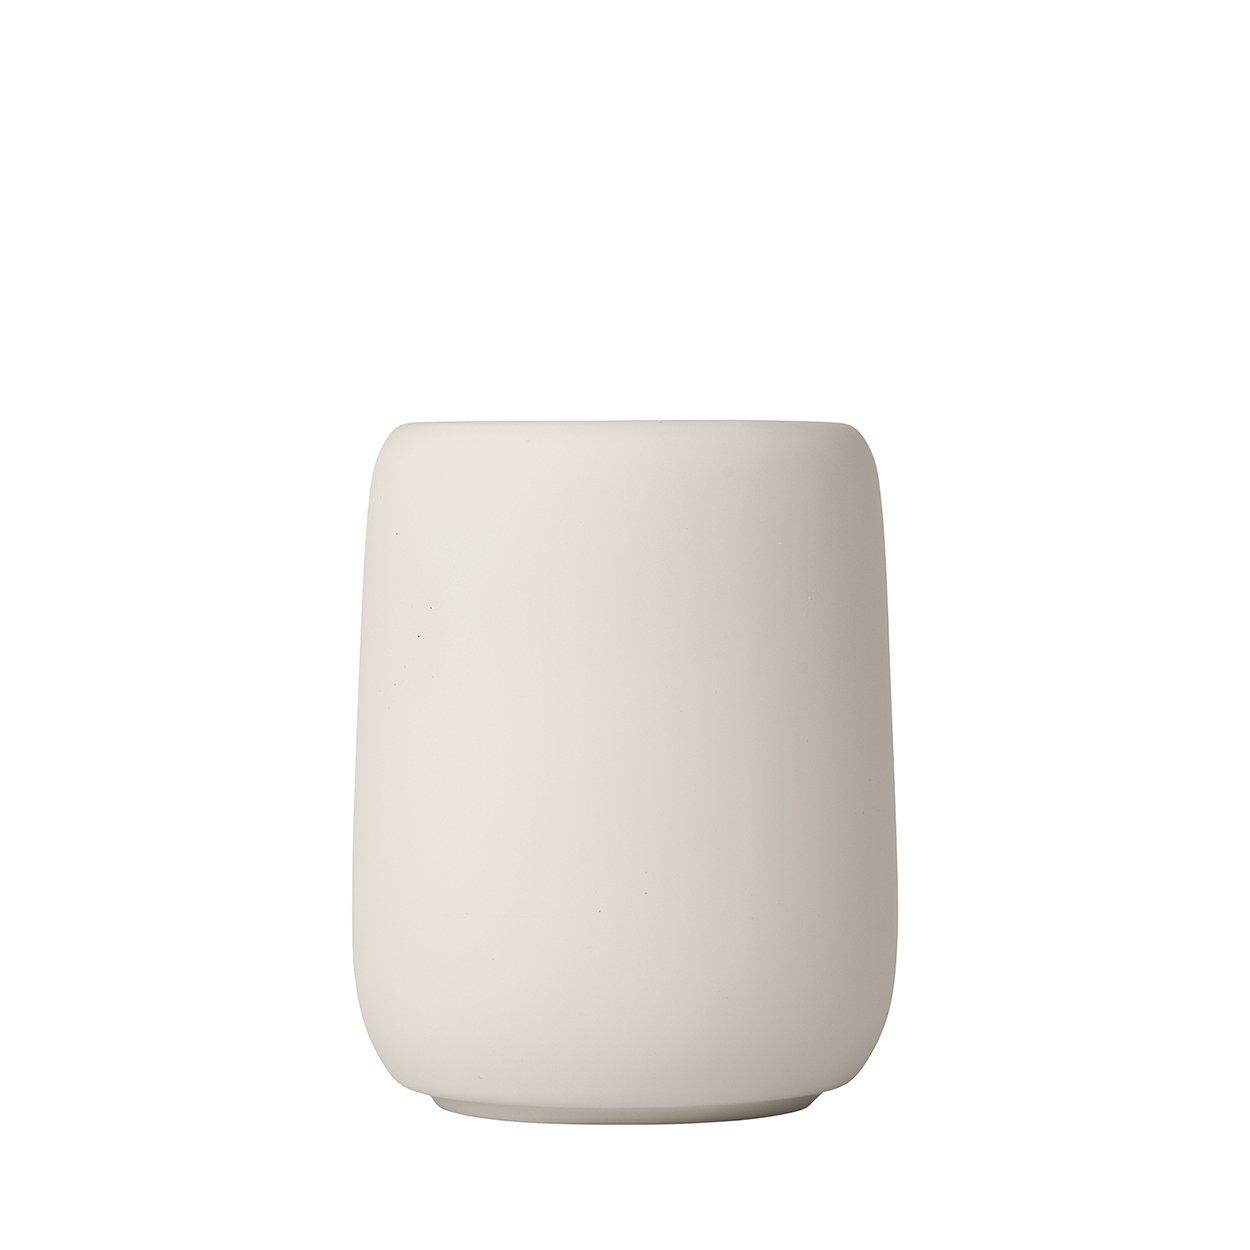 Blomus Sono Verre /à Dents C/éramique Silicone Moonbeam H 11 cm /Ø 8,5 cm V 0,3 L